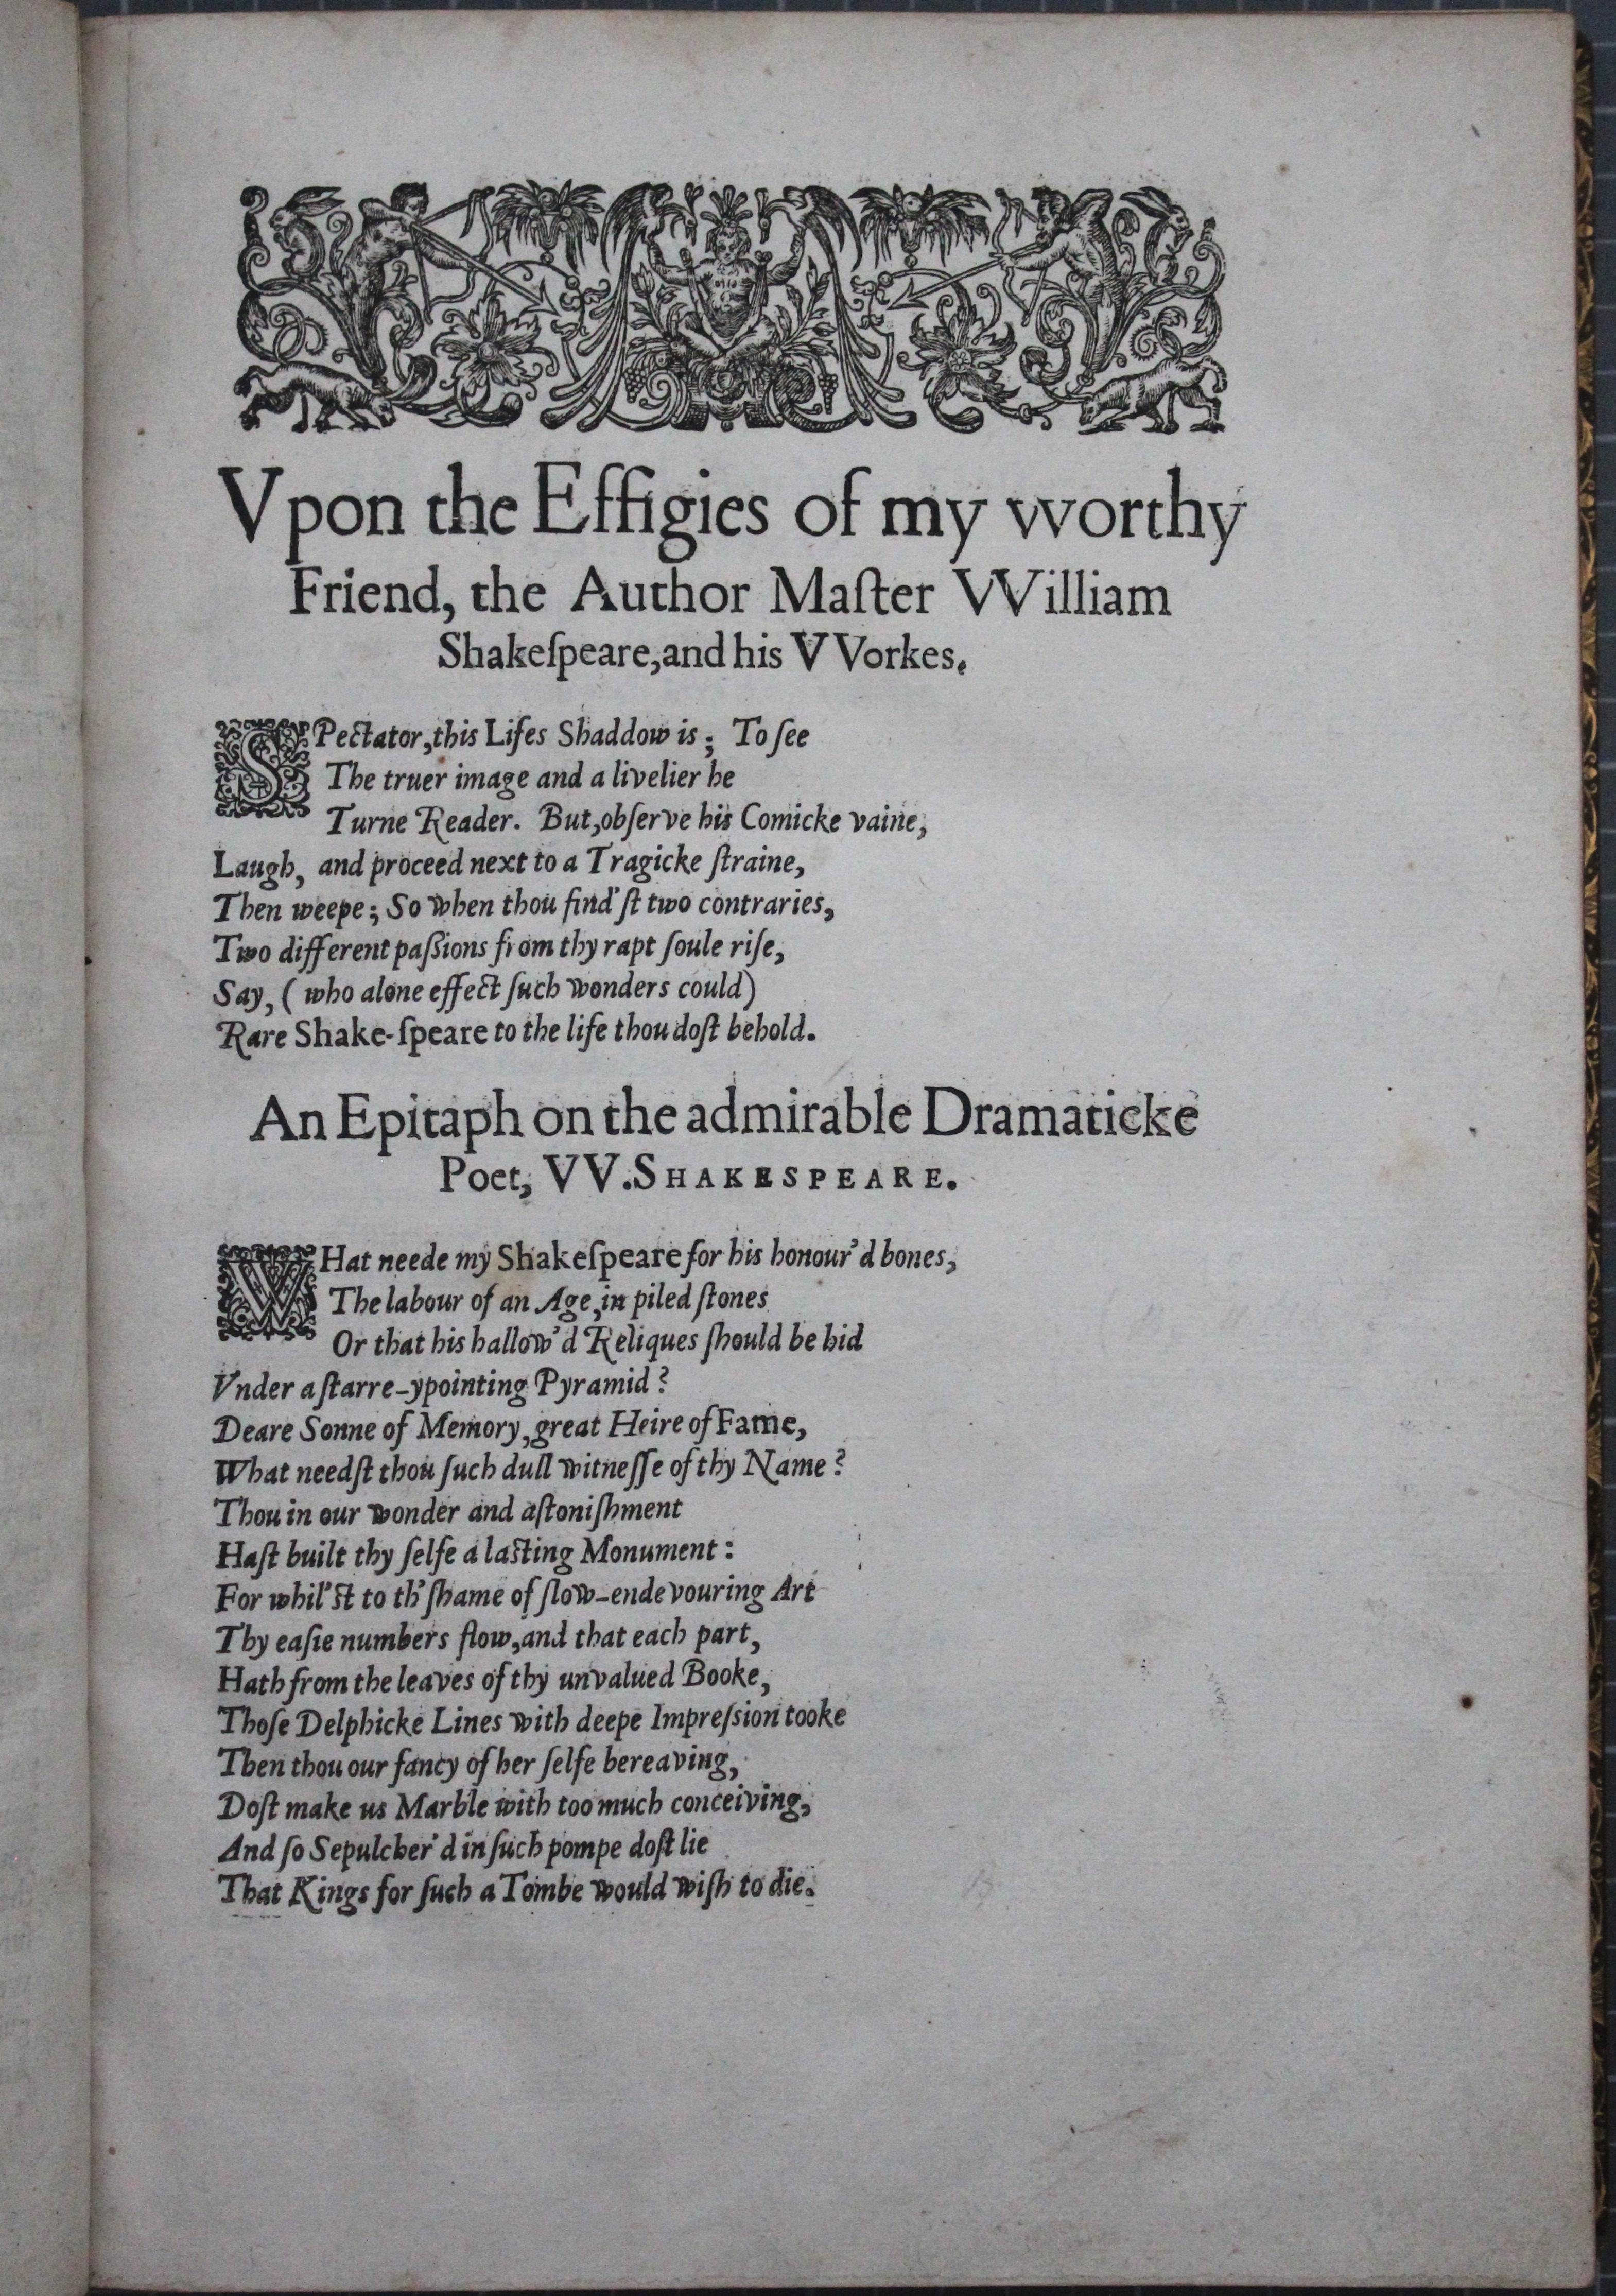 Thackeray.21.B.10_poem_1